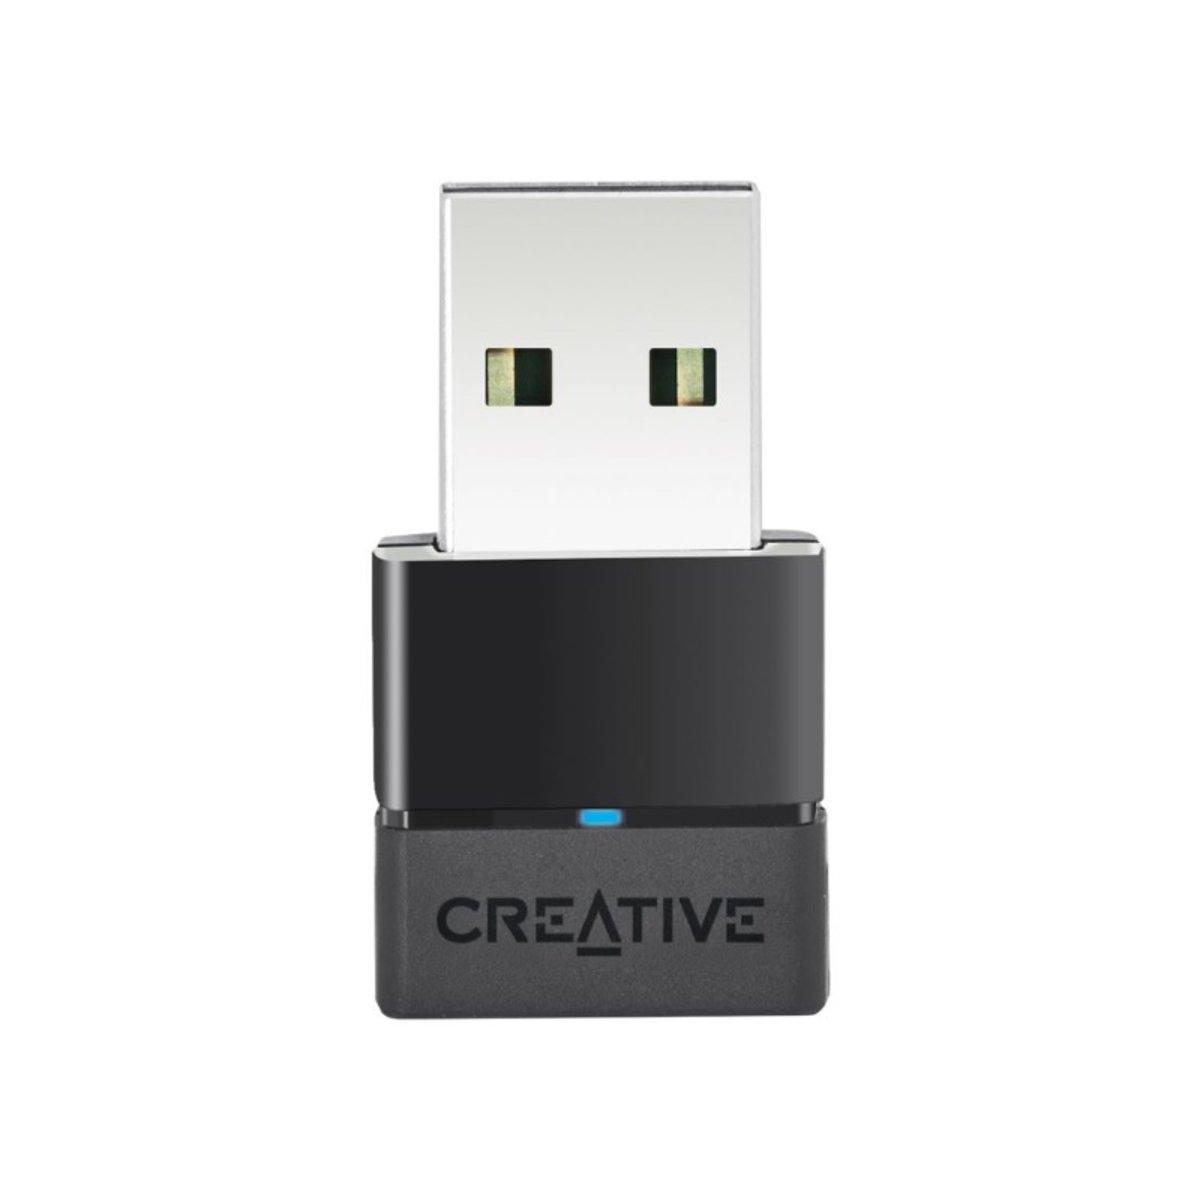 BT-W2 HIGH PERFORMANCE USB BLUETOOTH ADUIO TRANSCEIVER ( HP-BTW2 )